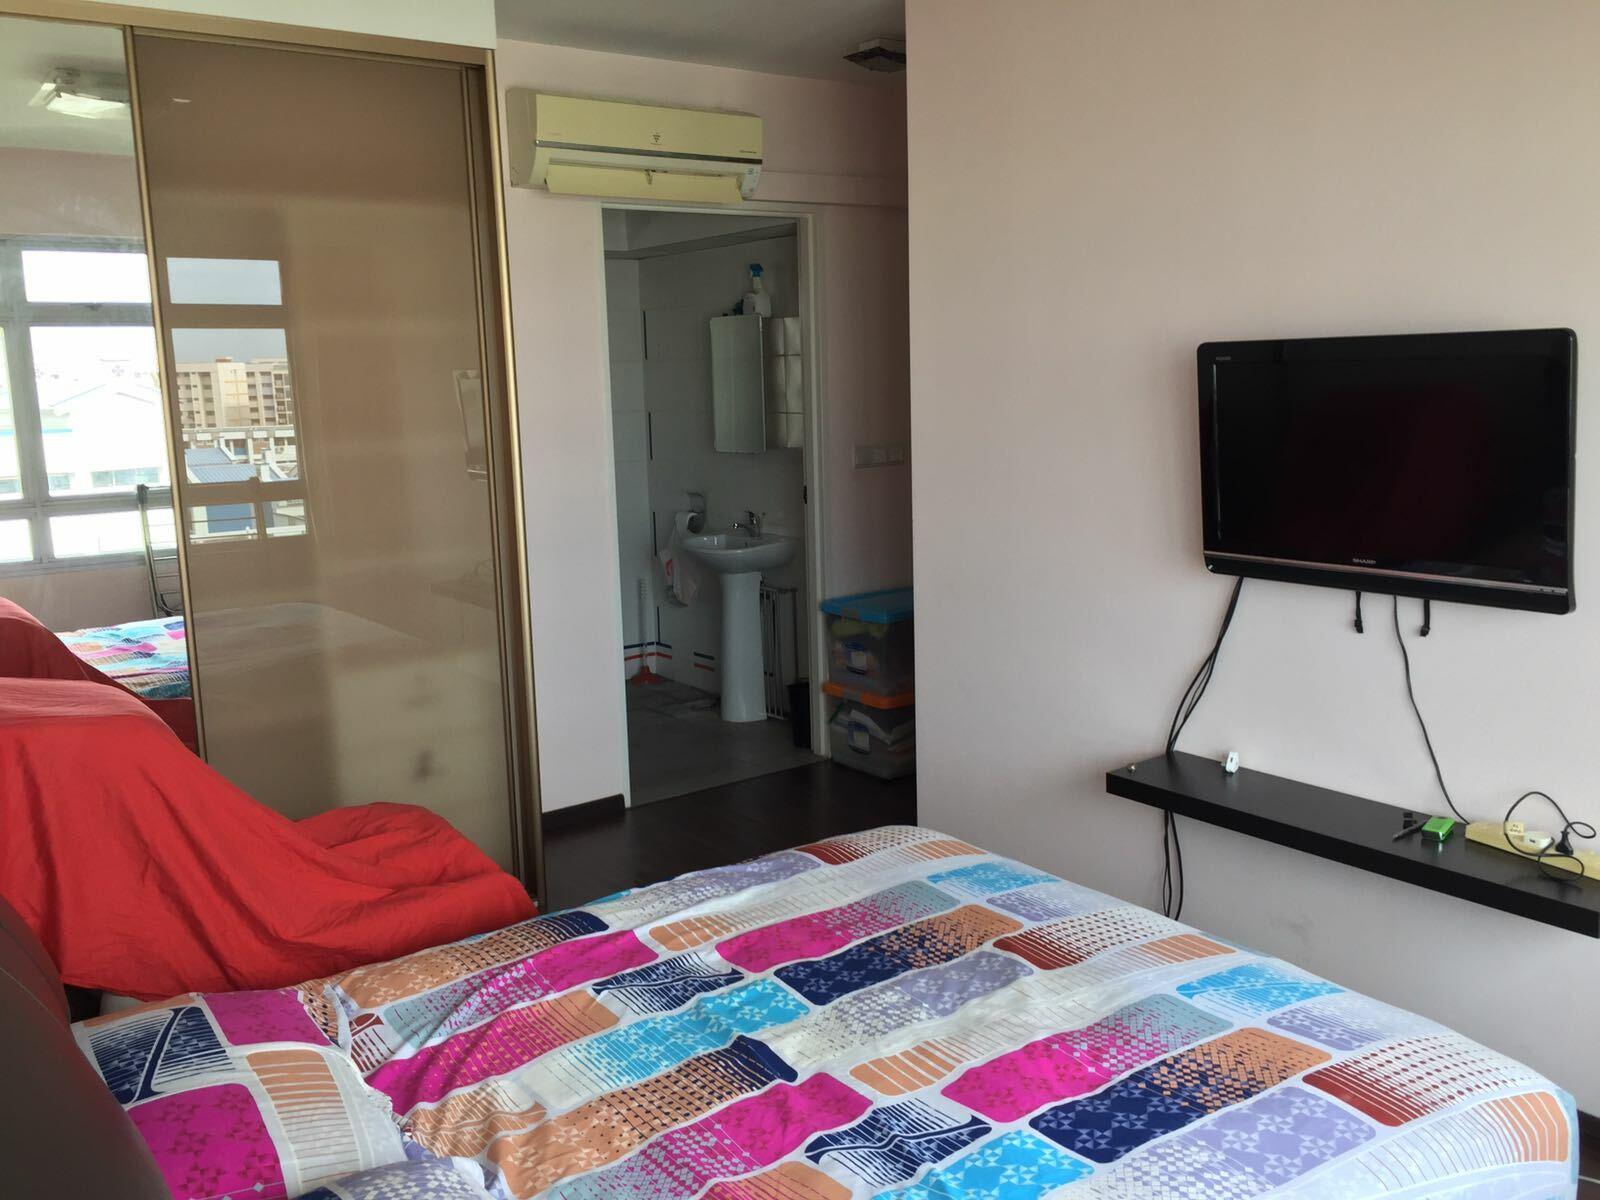 442 Yishun Avenue 11 442 Yishun Avenue 11 3 Bedrooms 990 Sqft Hdb Flats For Rent By Benny